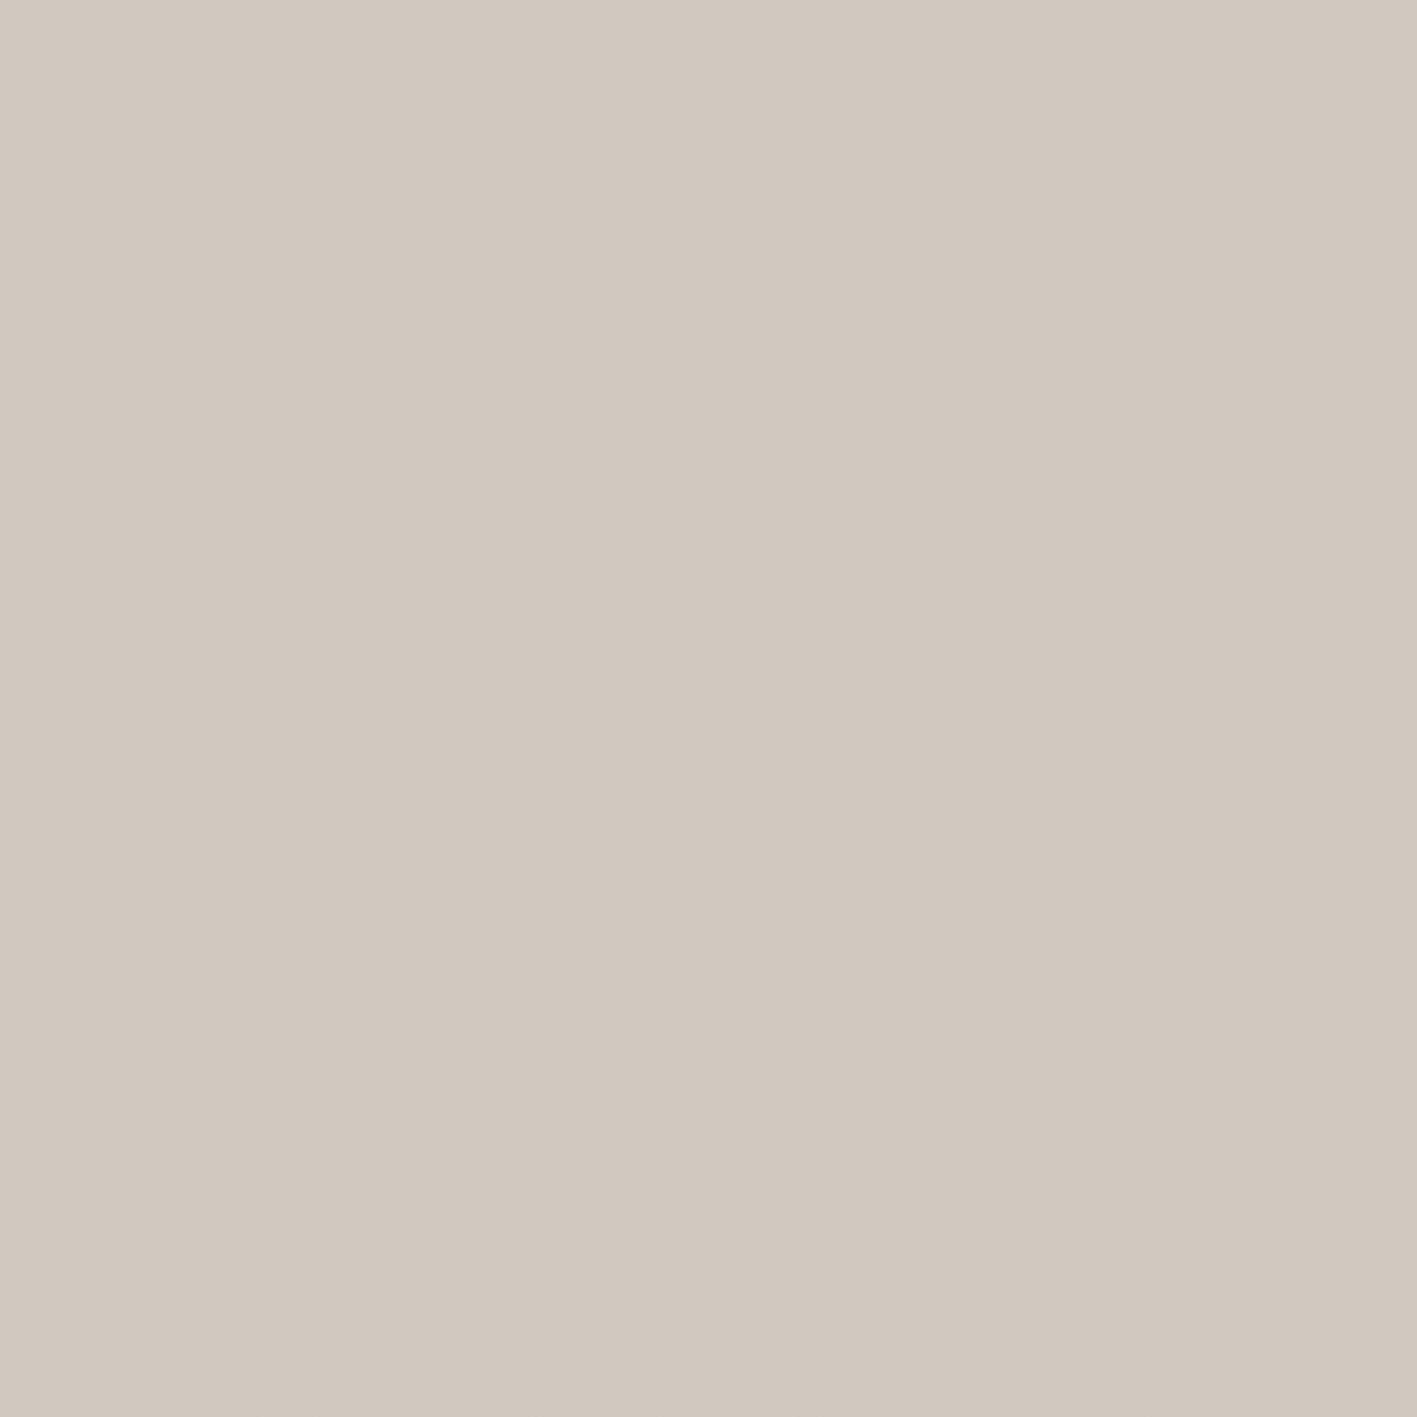 80ba13e coverlam basic cemento 120×120 rgb